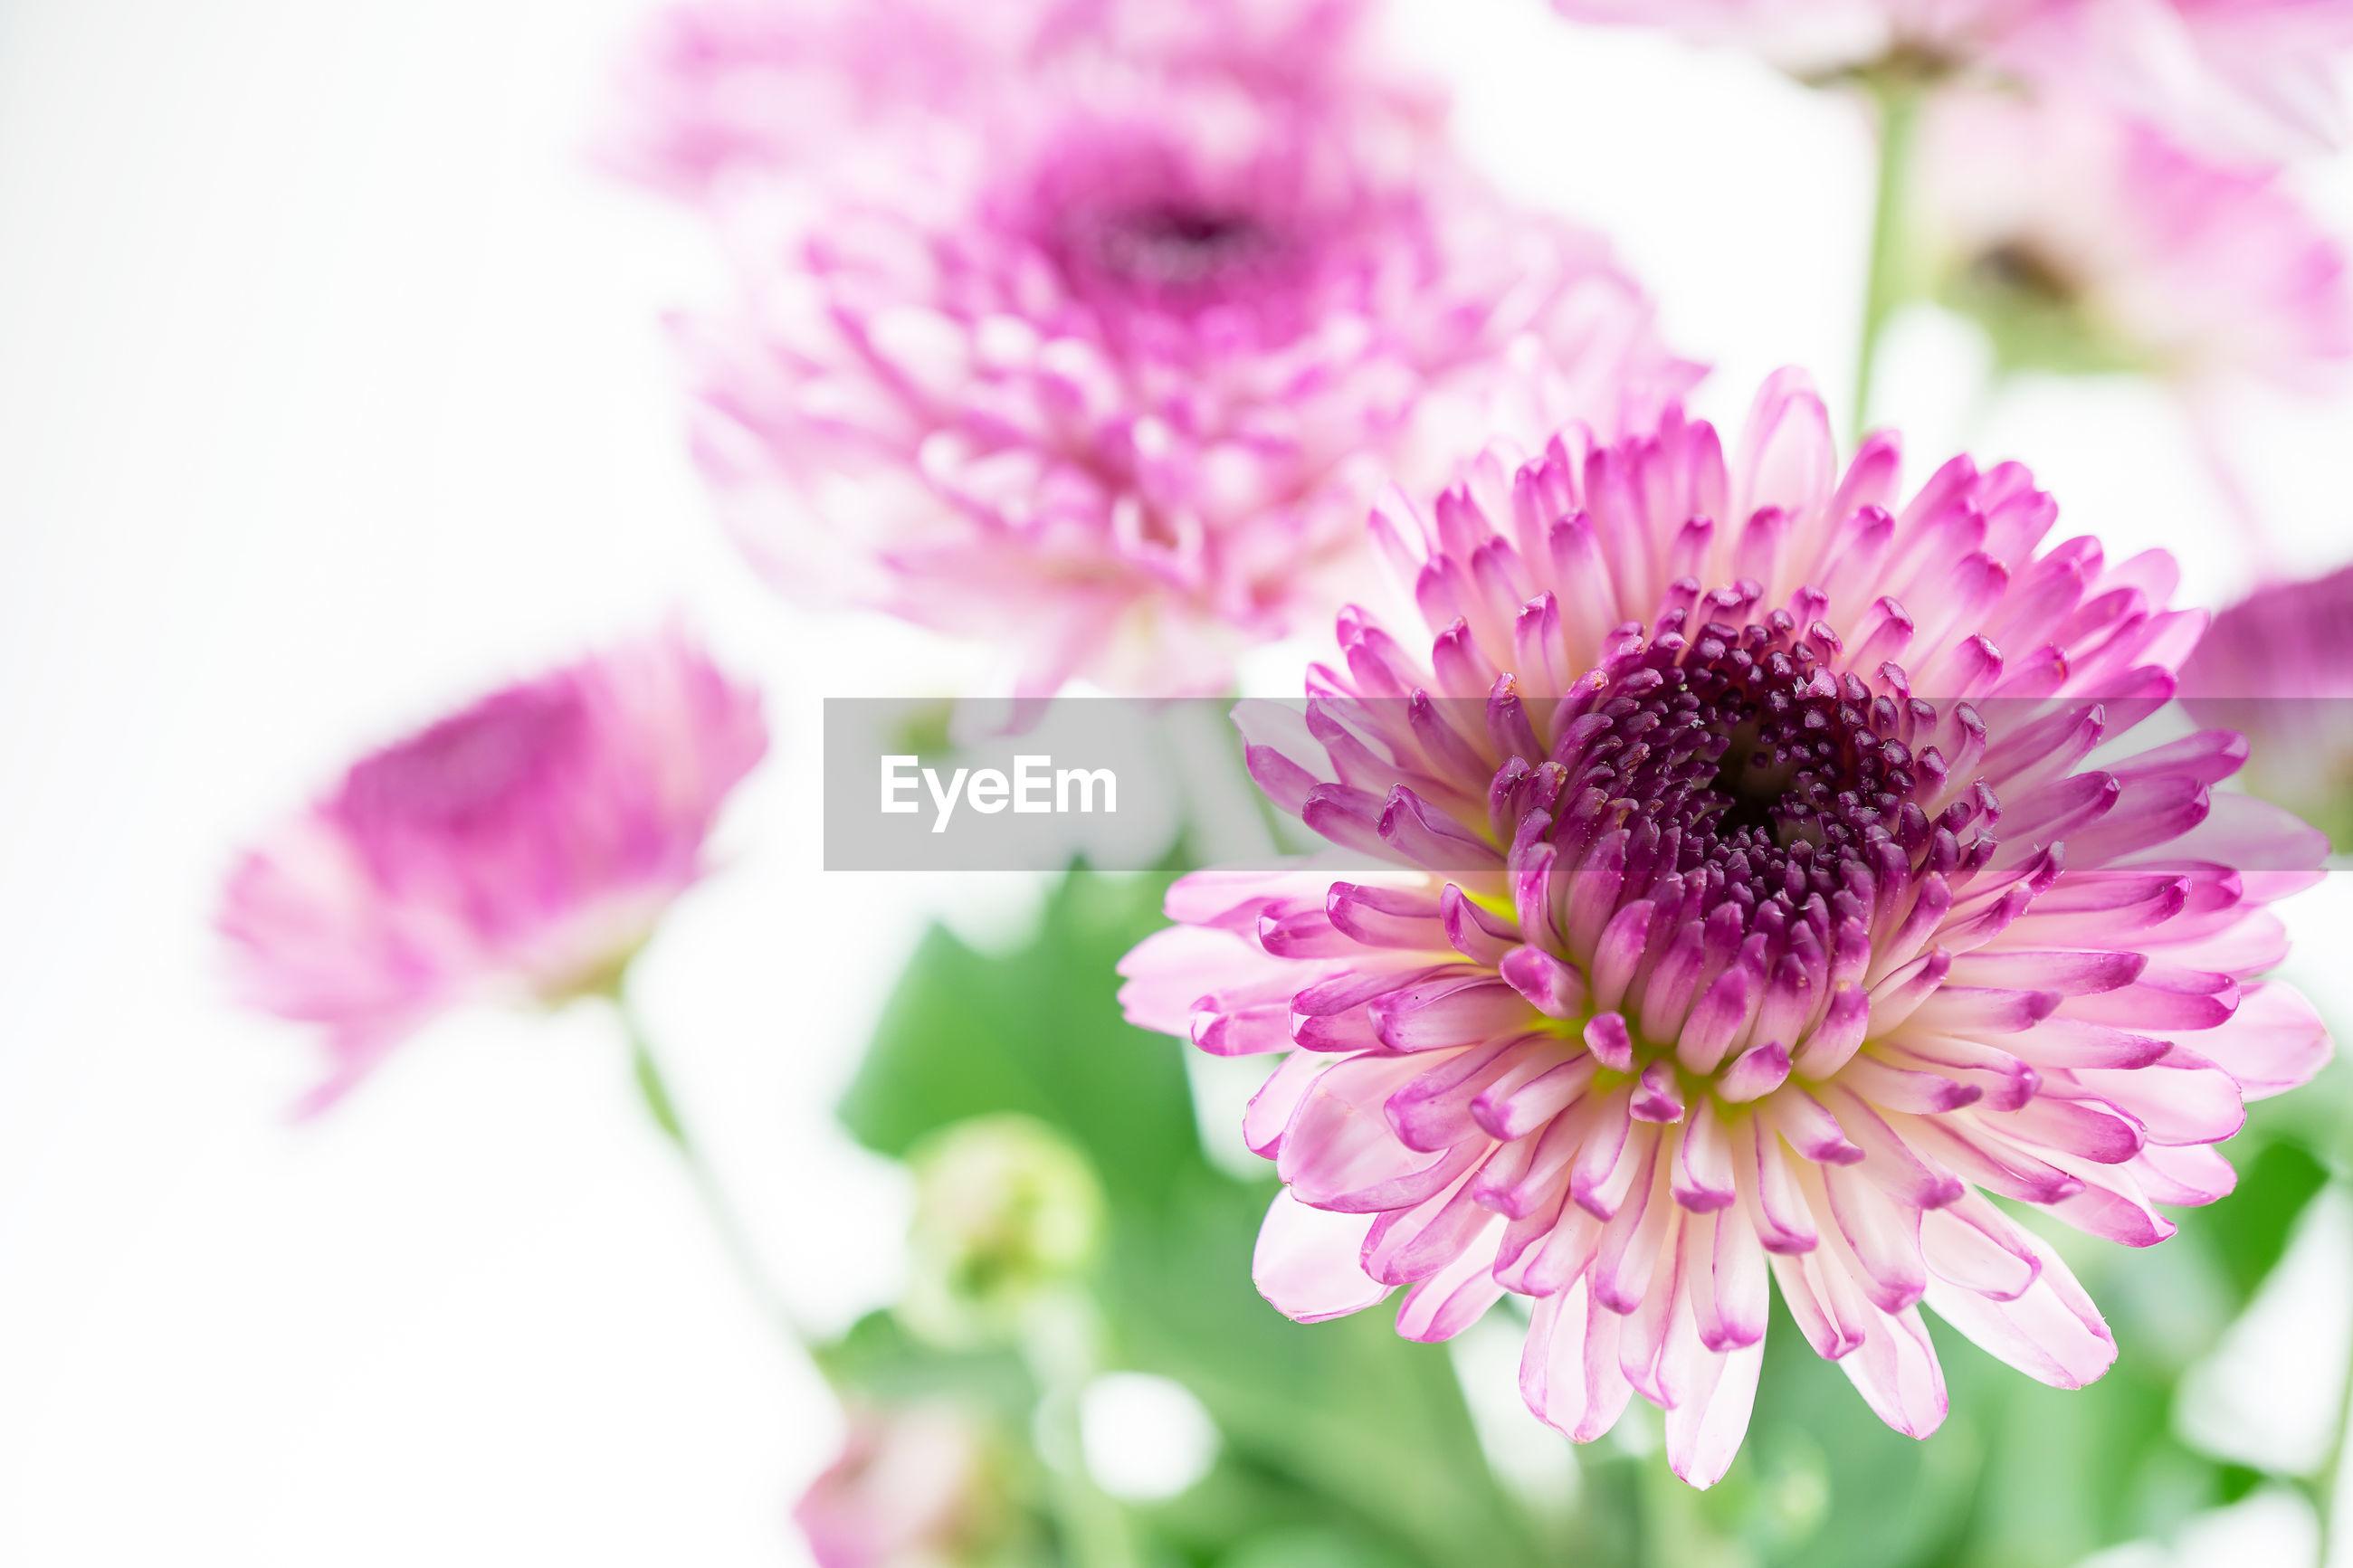 CLOSE-UP OF PINK FLOWERING PURPLE FLOWER